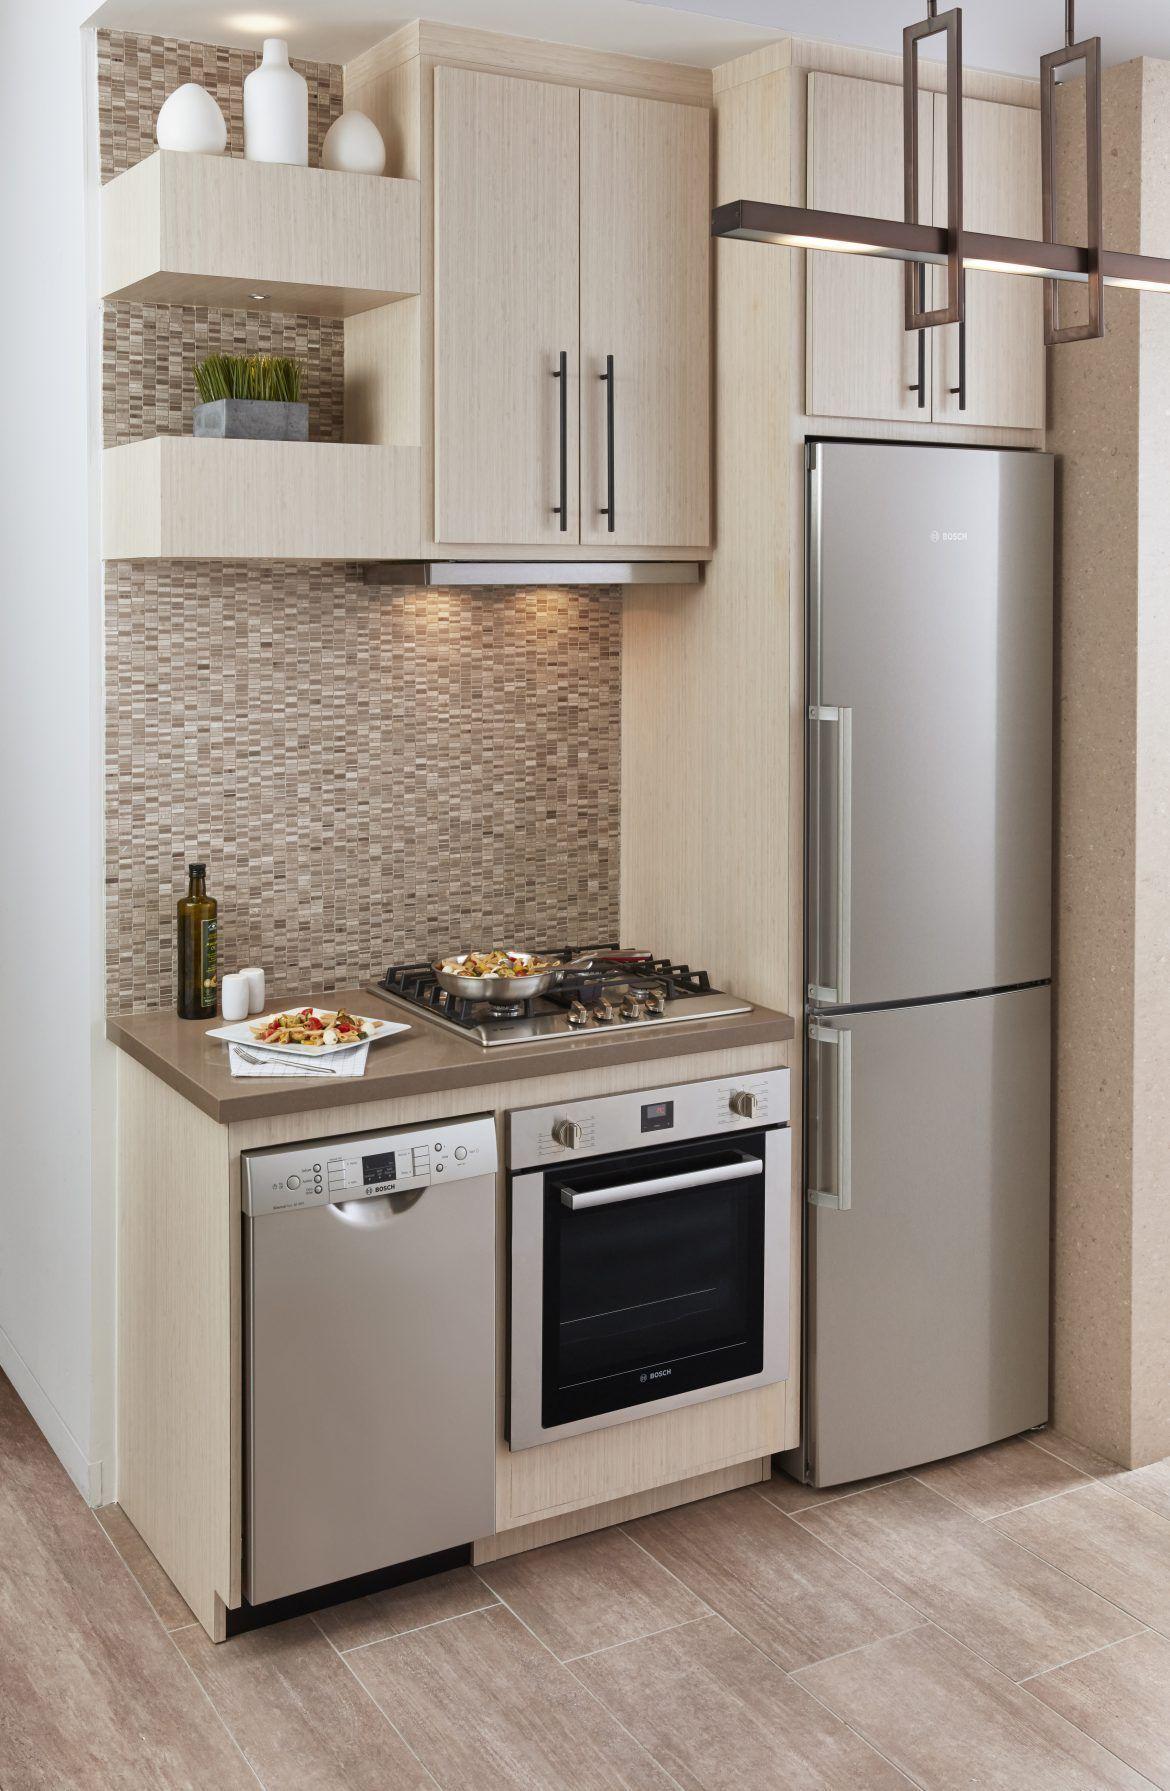 15 Impressed Greatest Small Kitchen Concepts For 2018 Blackwhiteandwoodkitchen Simple Kitchen Design Kitchen Design Small Space Tiny House Kitchen Appliances